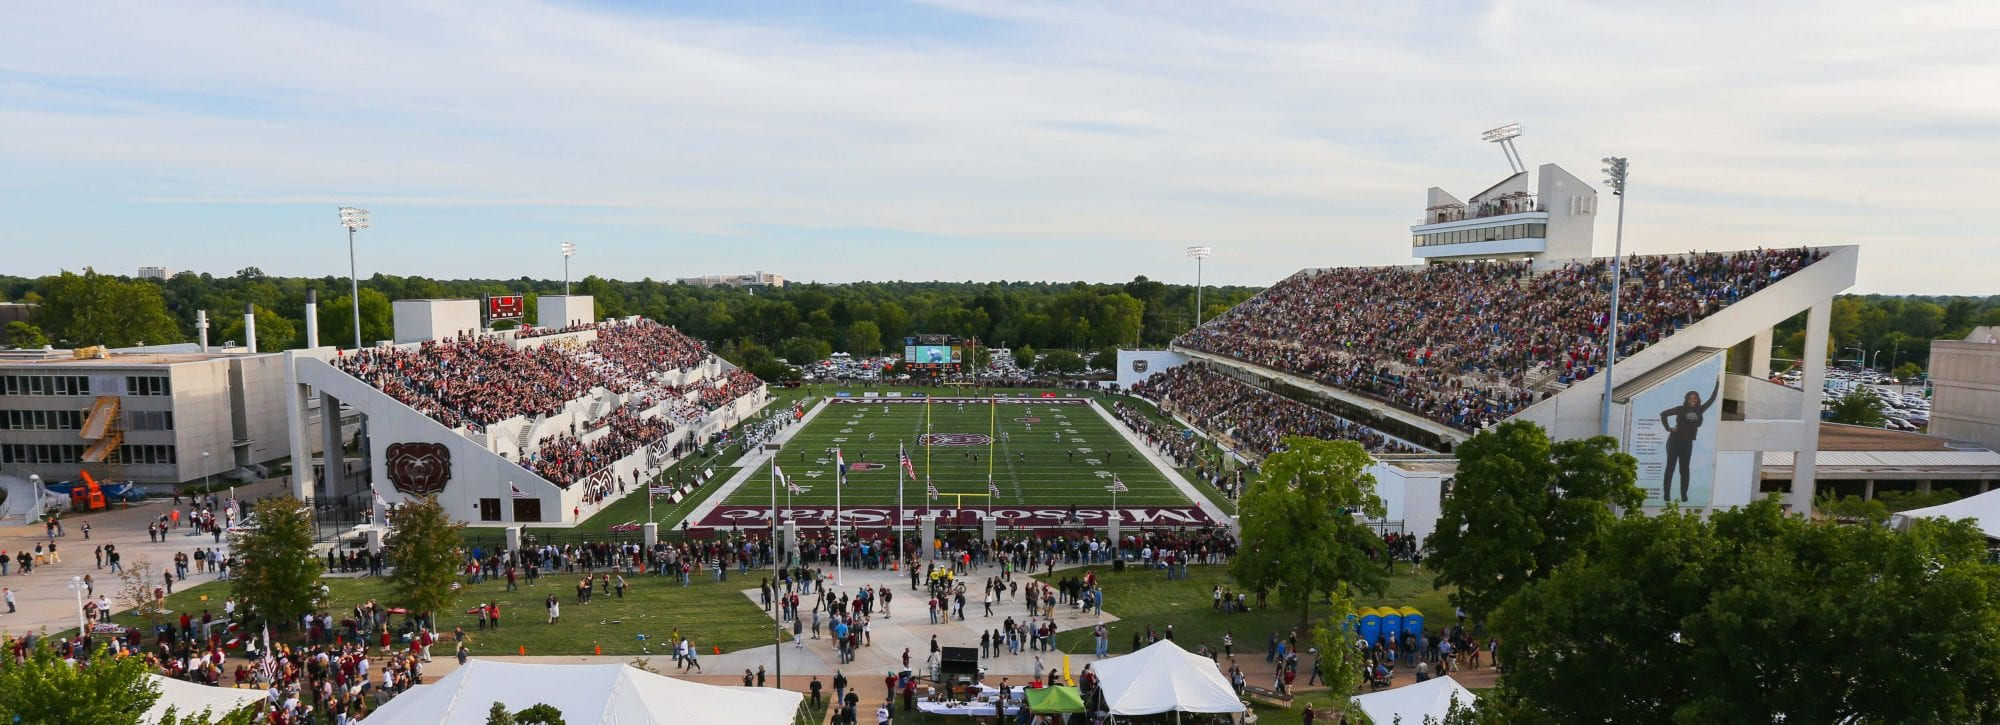 Missouri-State-University-Plaster-Stadium